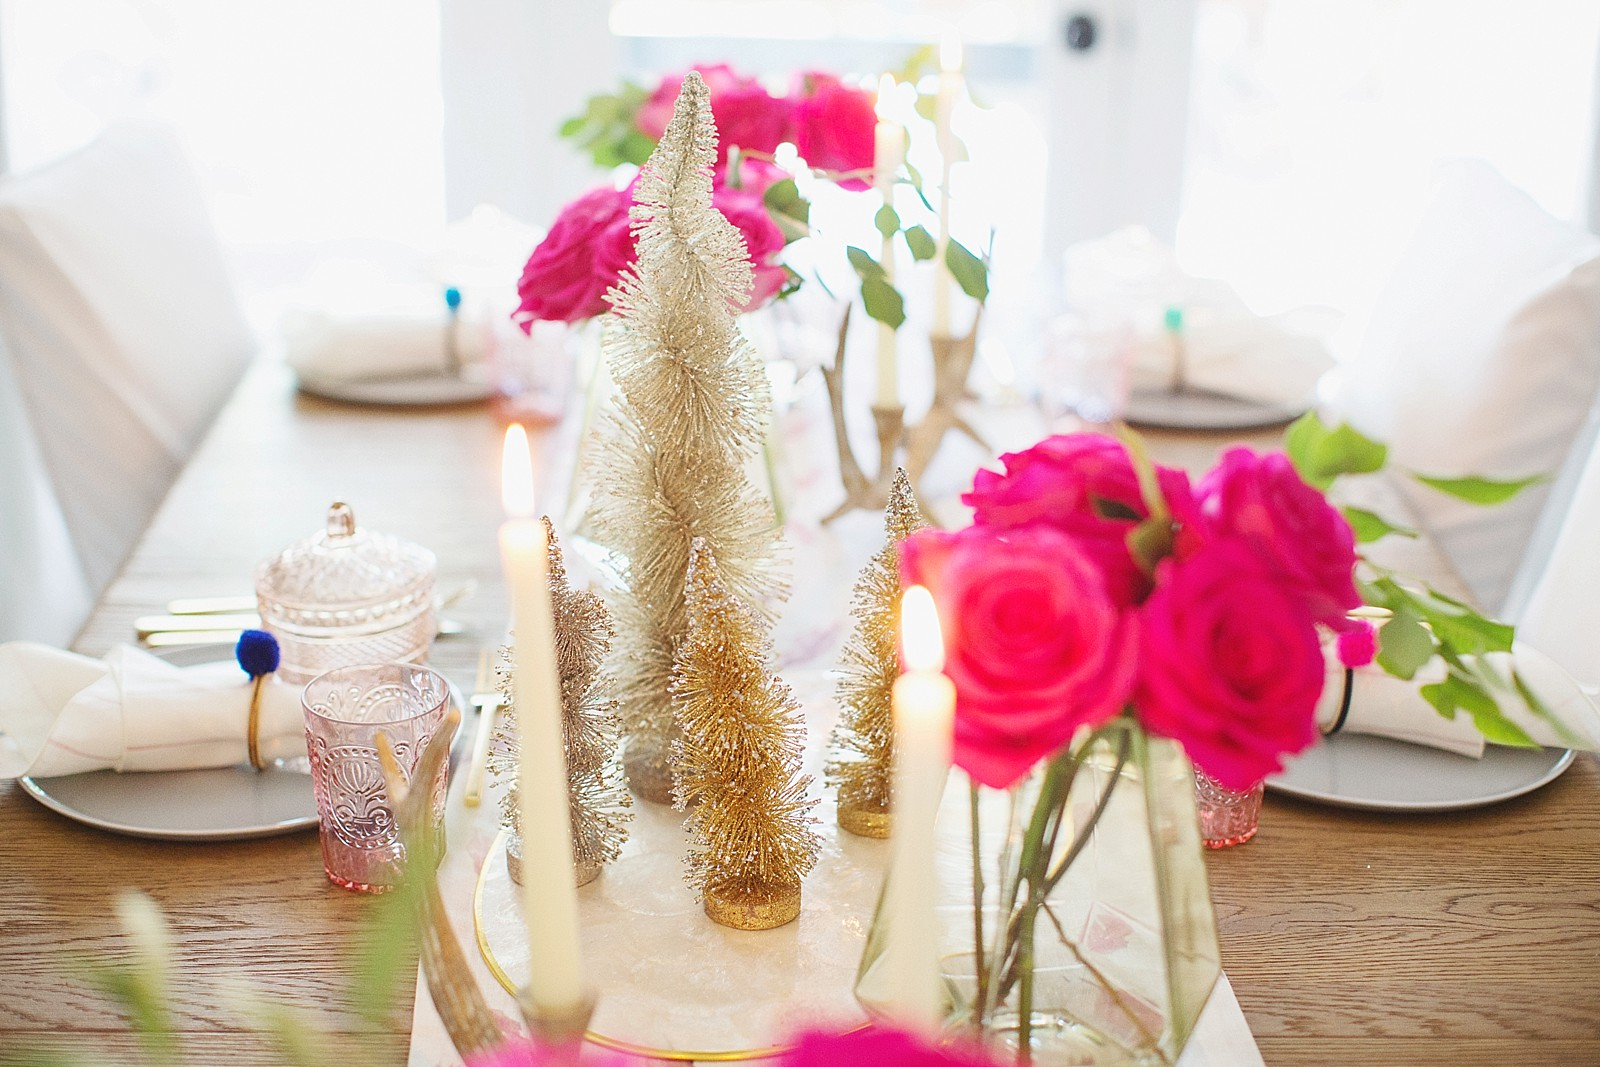 minted-christmas-inspiration-girls-party-photos-diana-elizabeth-blog-lifestyle-hostess-entertainment-home-blog-2266